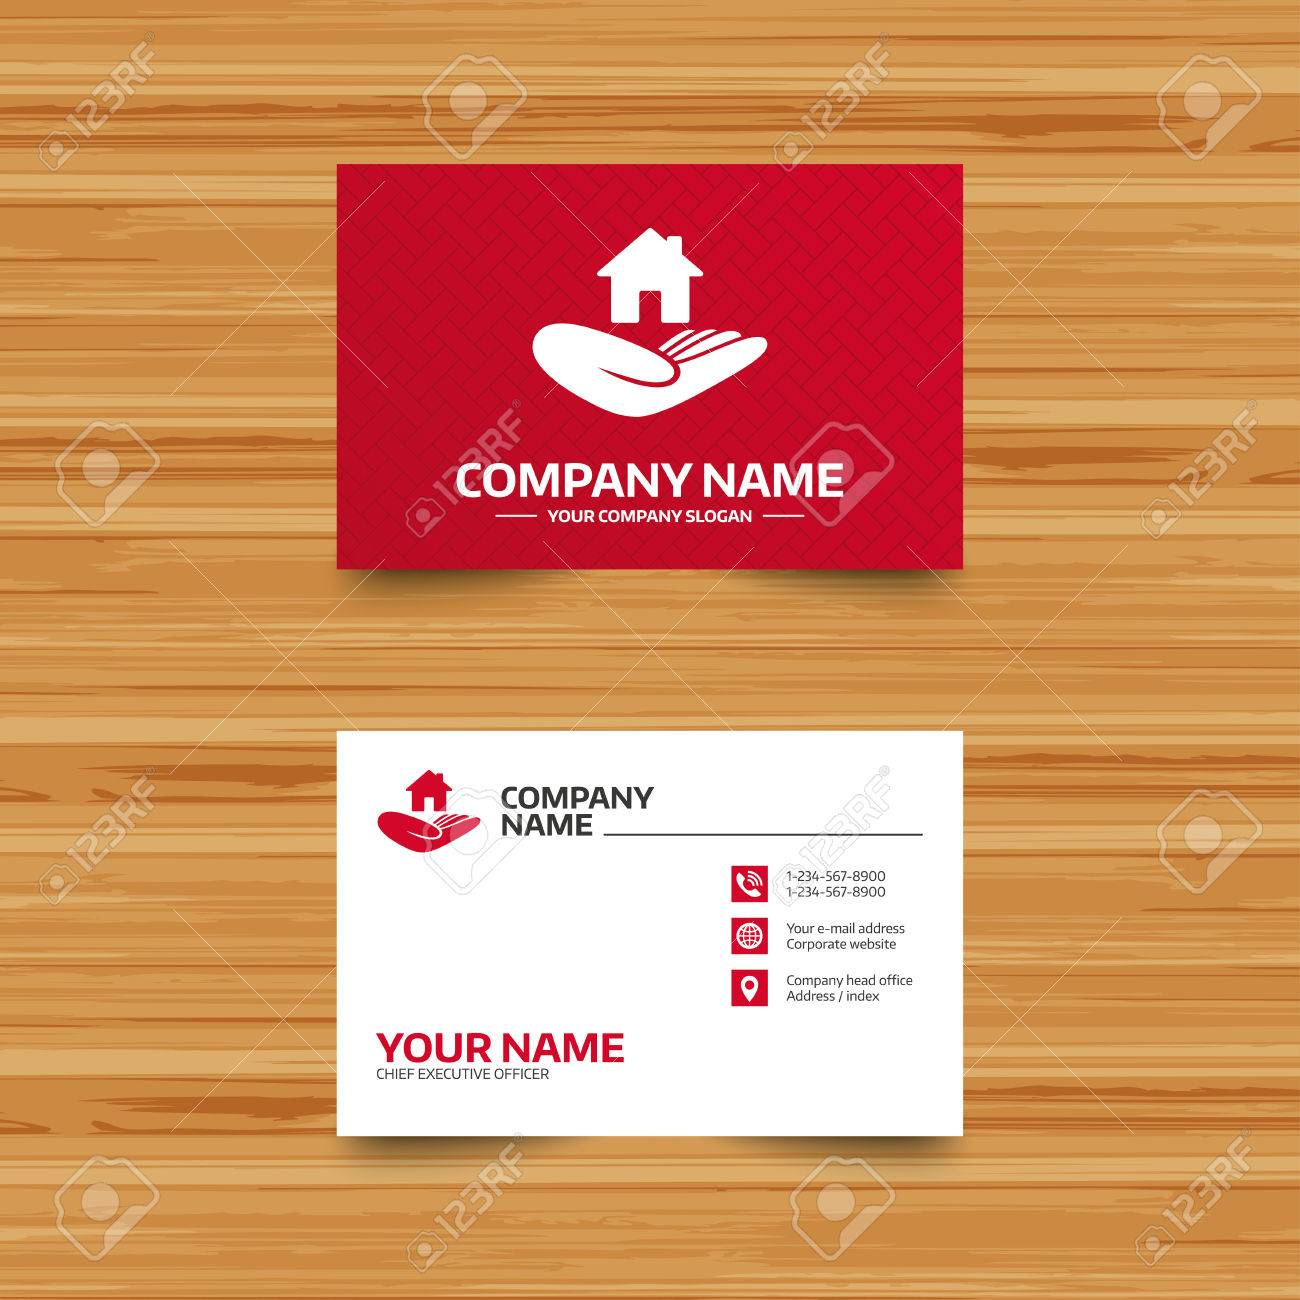 Business card template house insurance sign hand holds home business card template house insurance sign hand holds home symbol insurance of property colourmoves